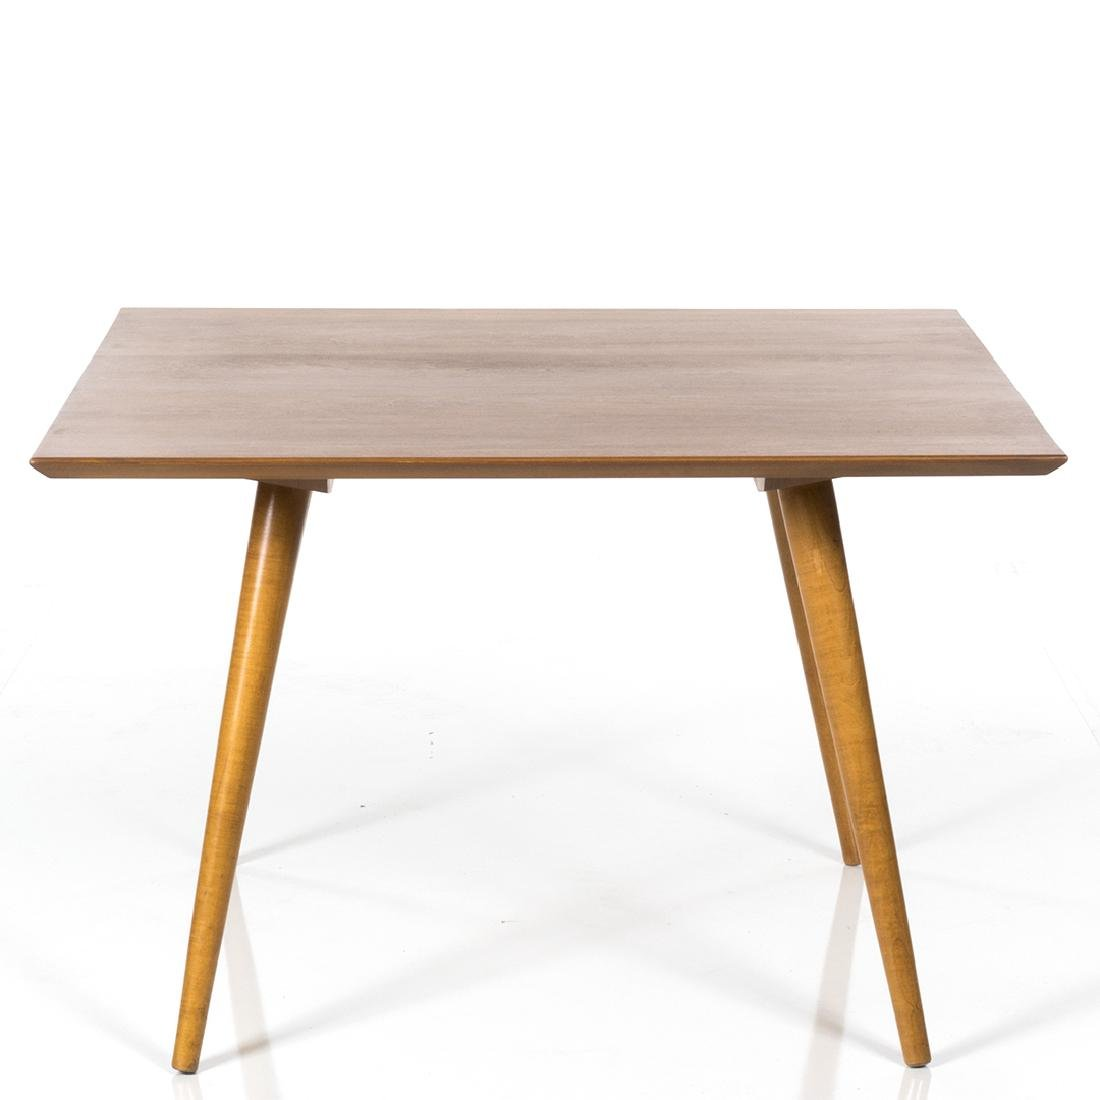 Paul McCobb Coffee Table - 2